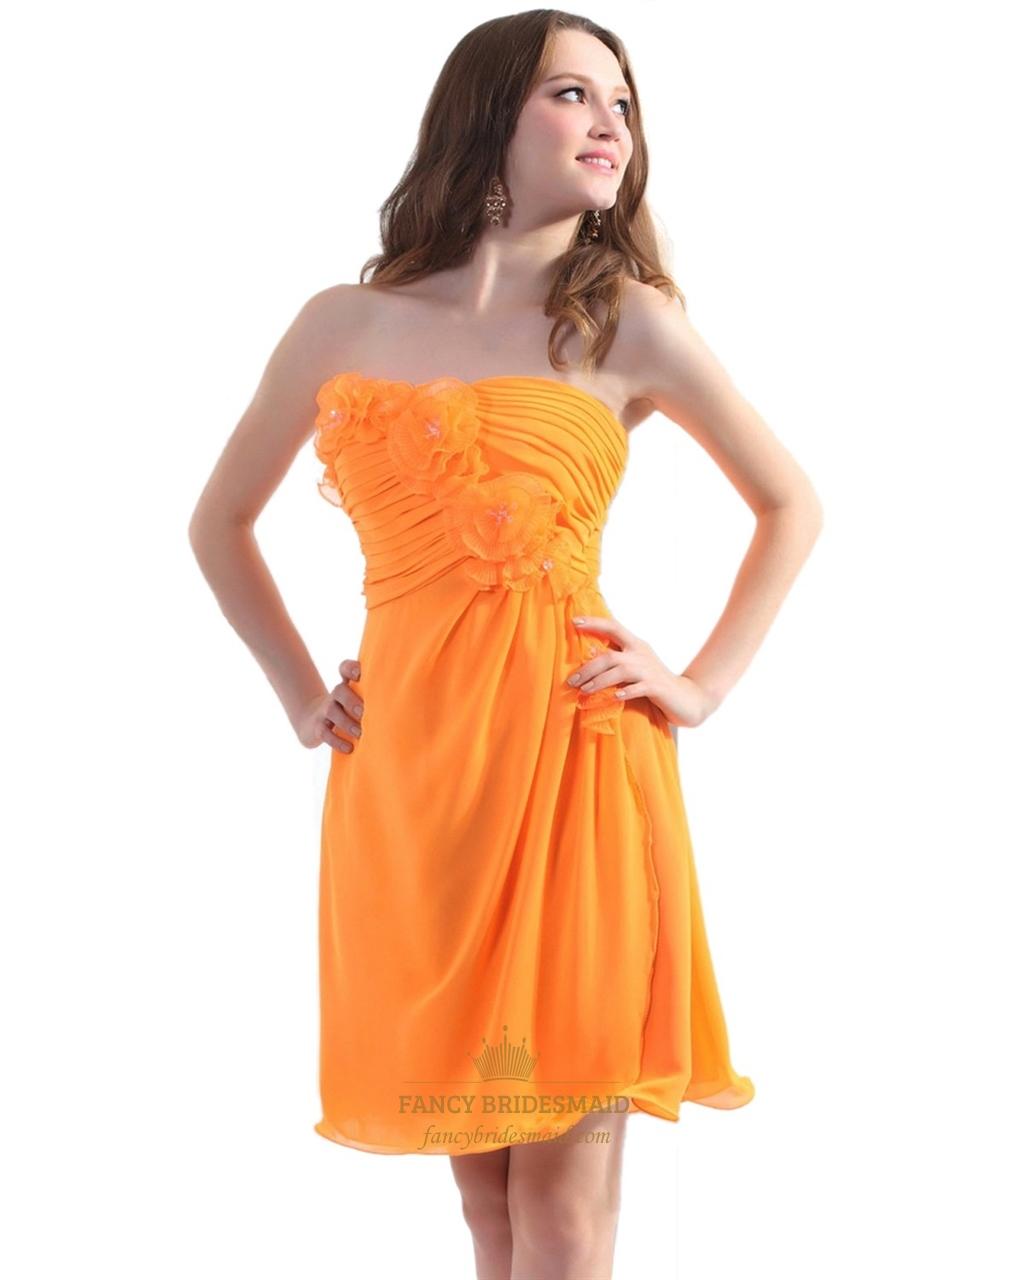 Orange Chiffon Strapless Short Bridesmaid Dresses With